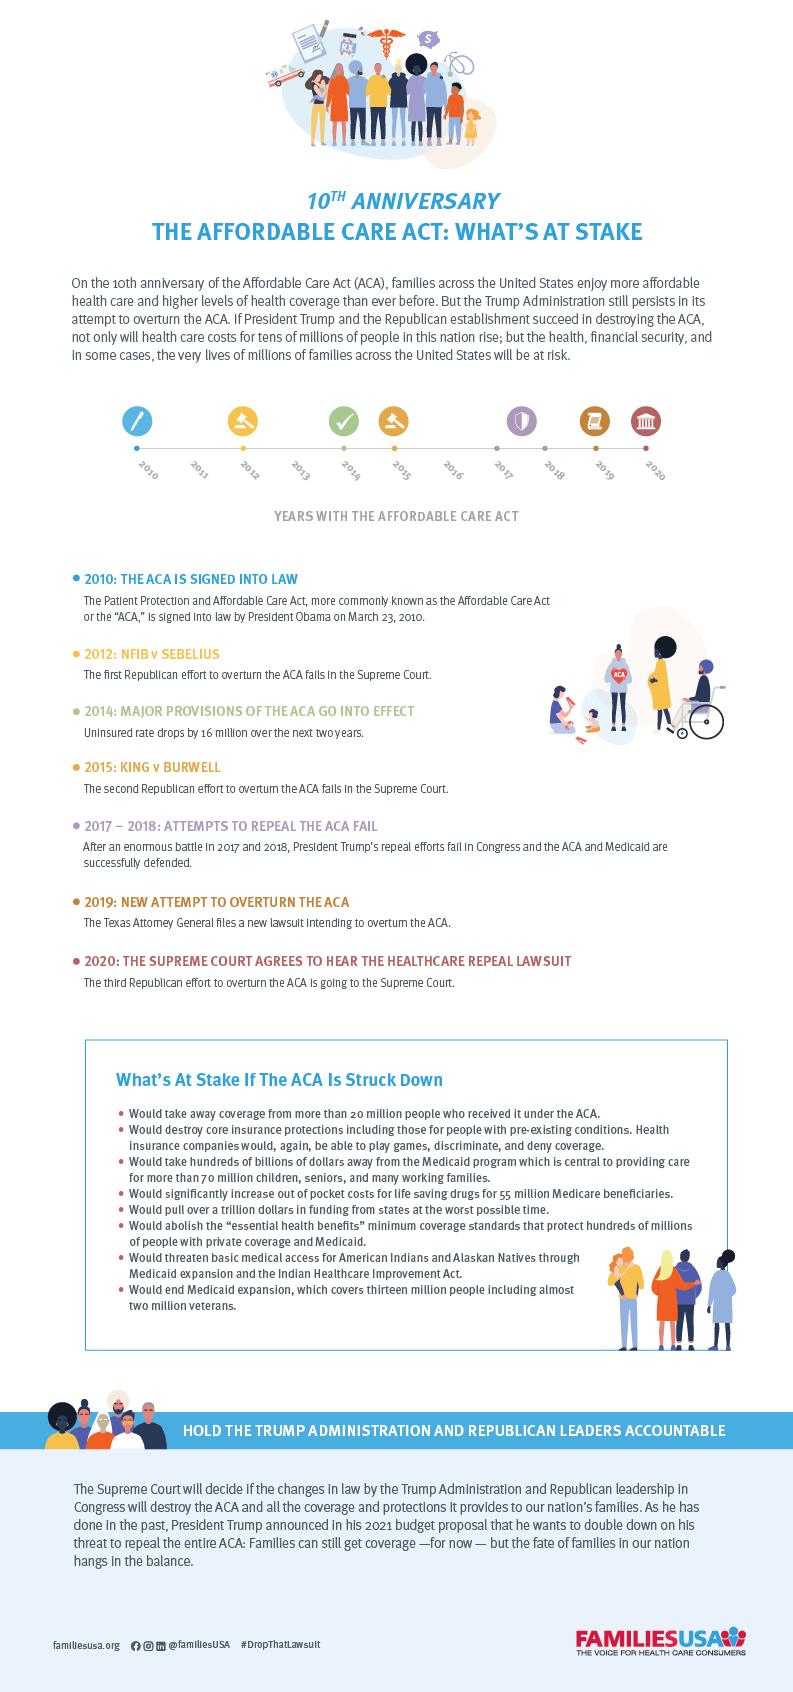 https://familiesusa.org/wp-content/uploads/2020/03/COV_ACA-10th-Anniversary_Infographic_Original.png